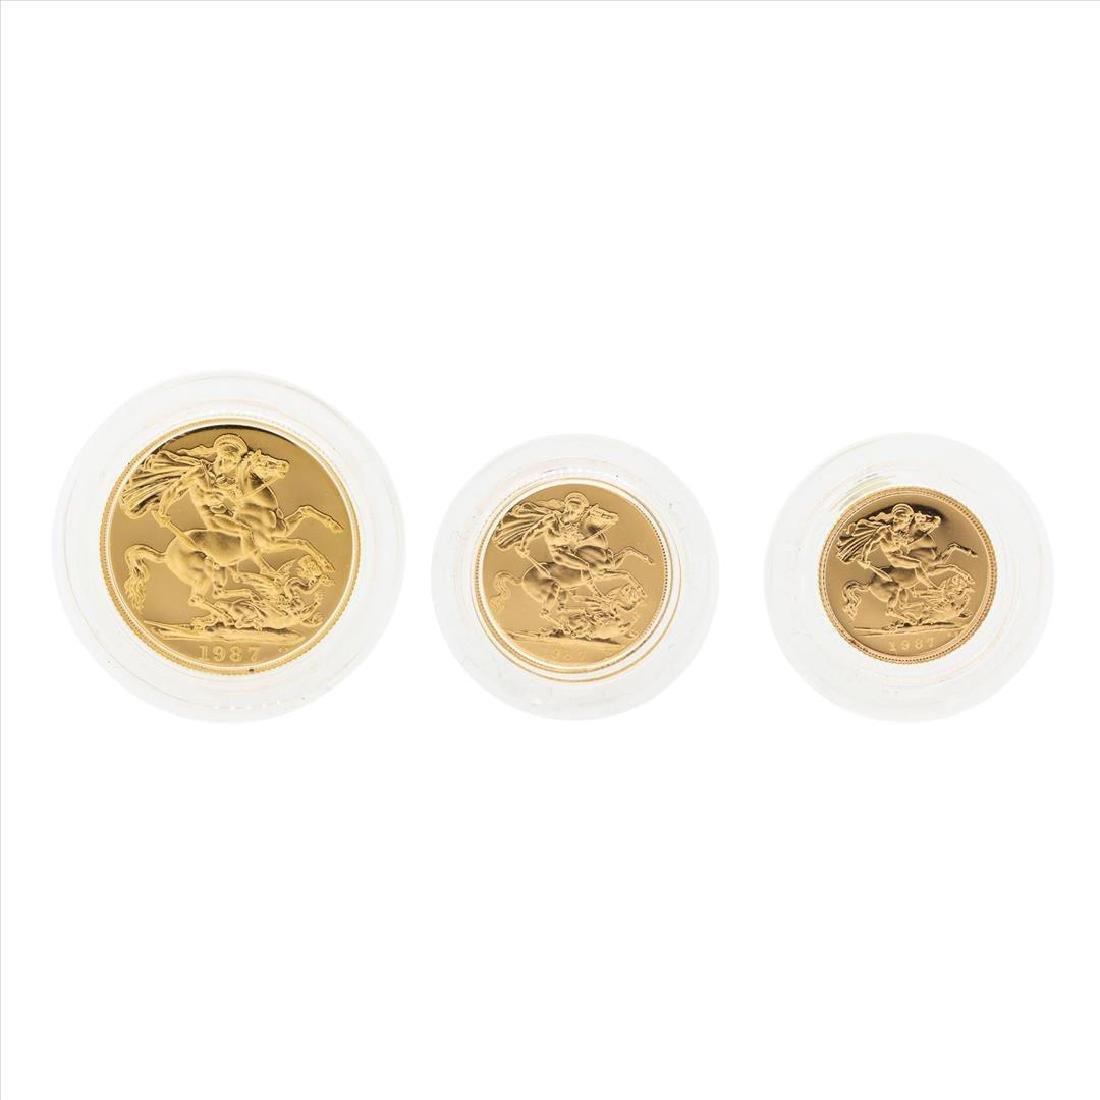 Set of (3) 1987 United Kingdom Gold Proof Coins - 2